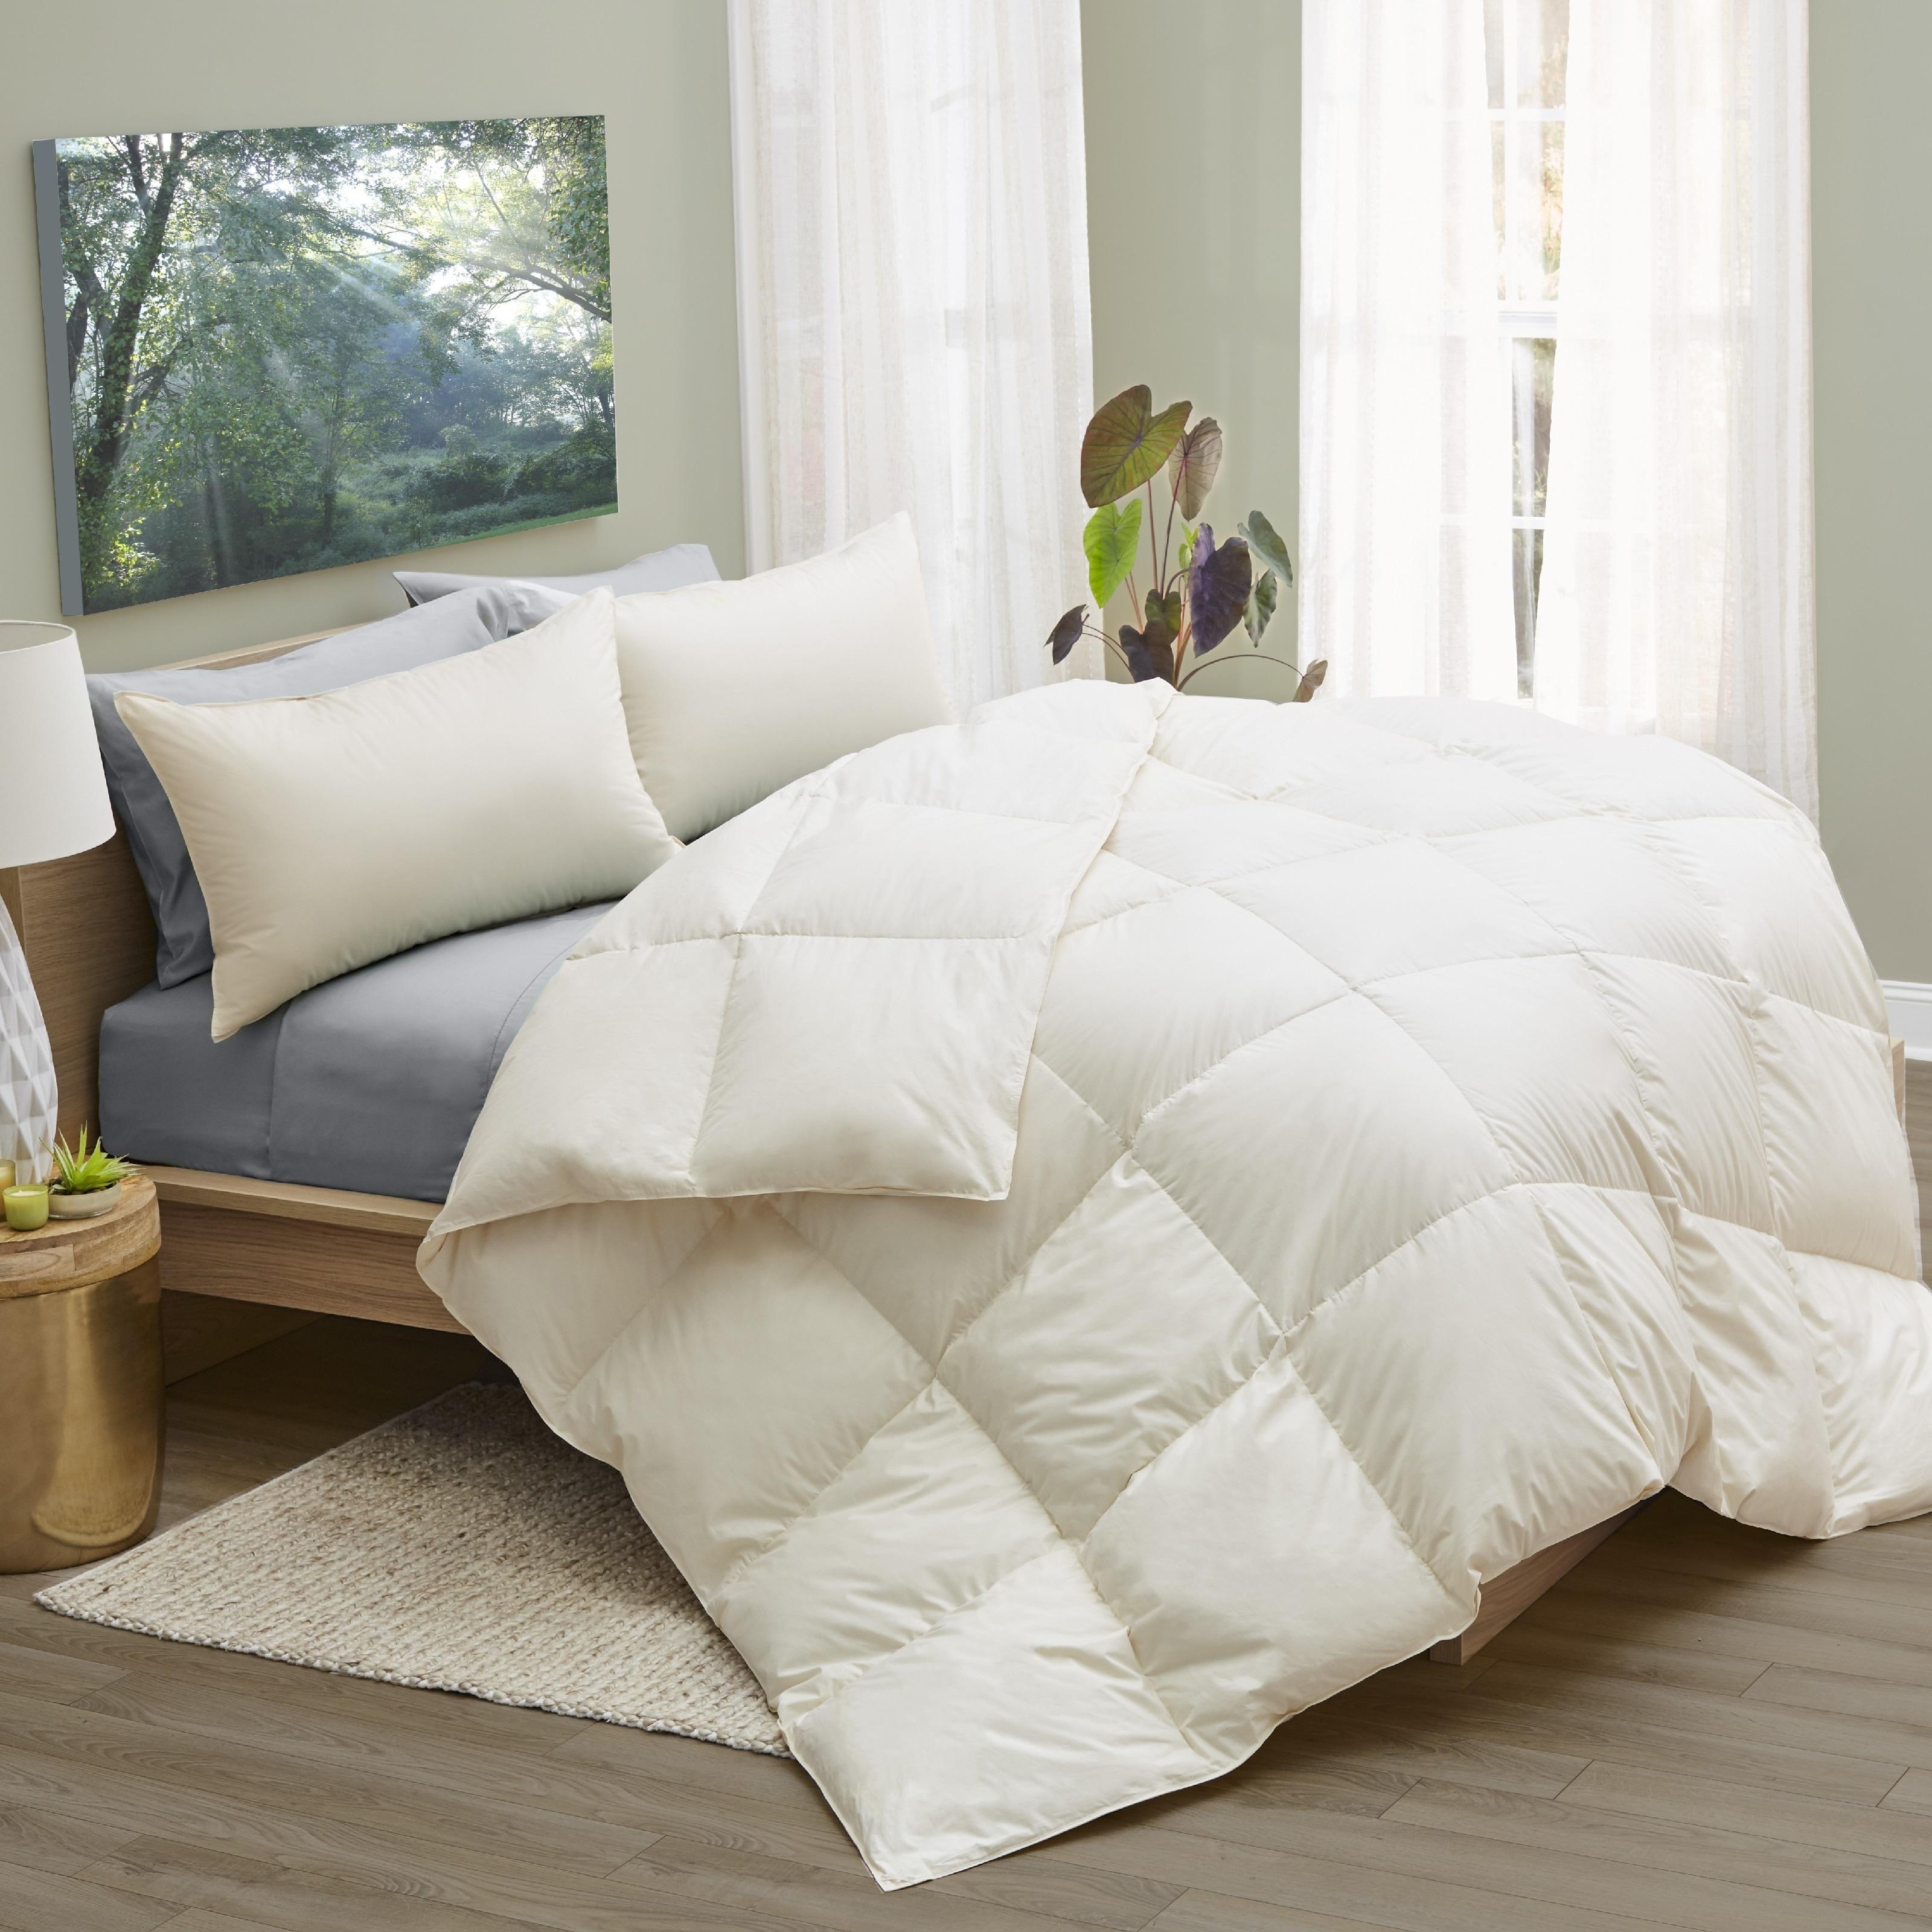 twin cover duvet linen bed comforter cotton organic eco